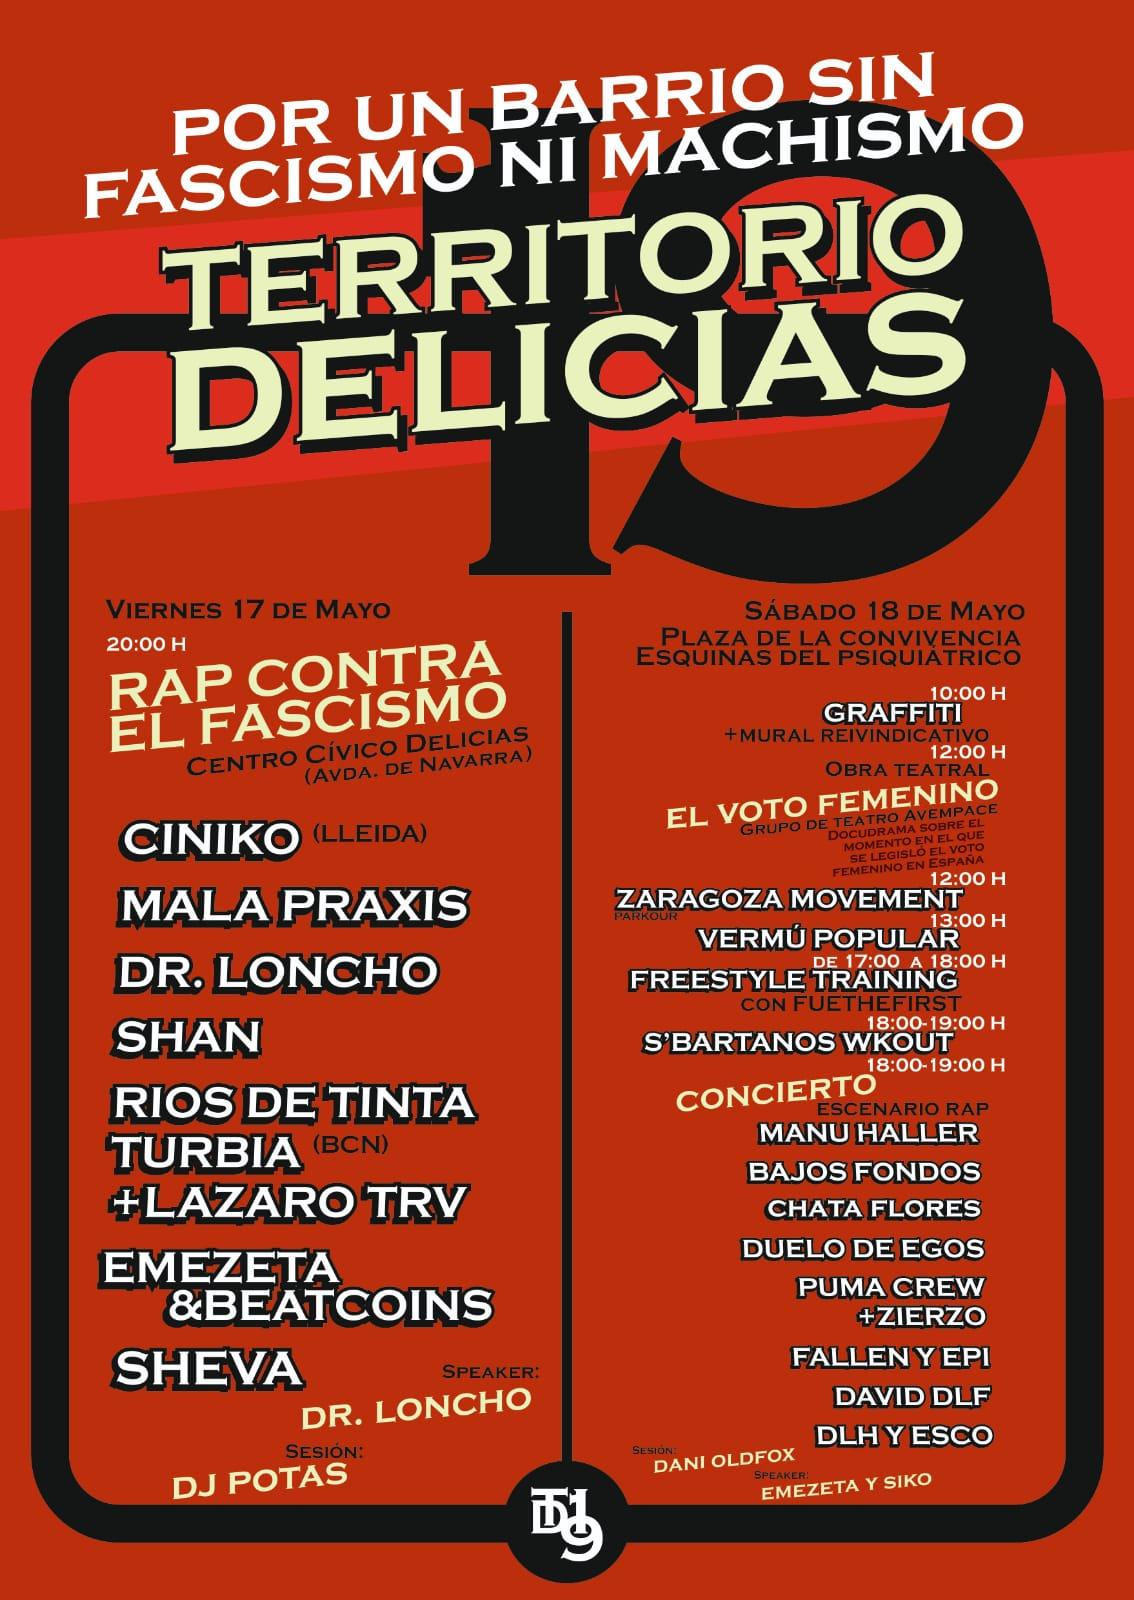 Territorio Delicias 19